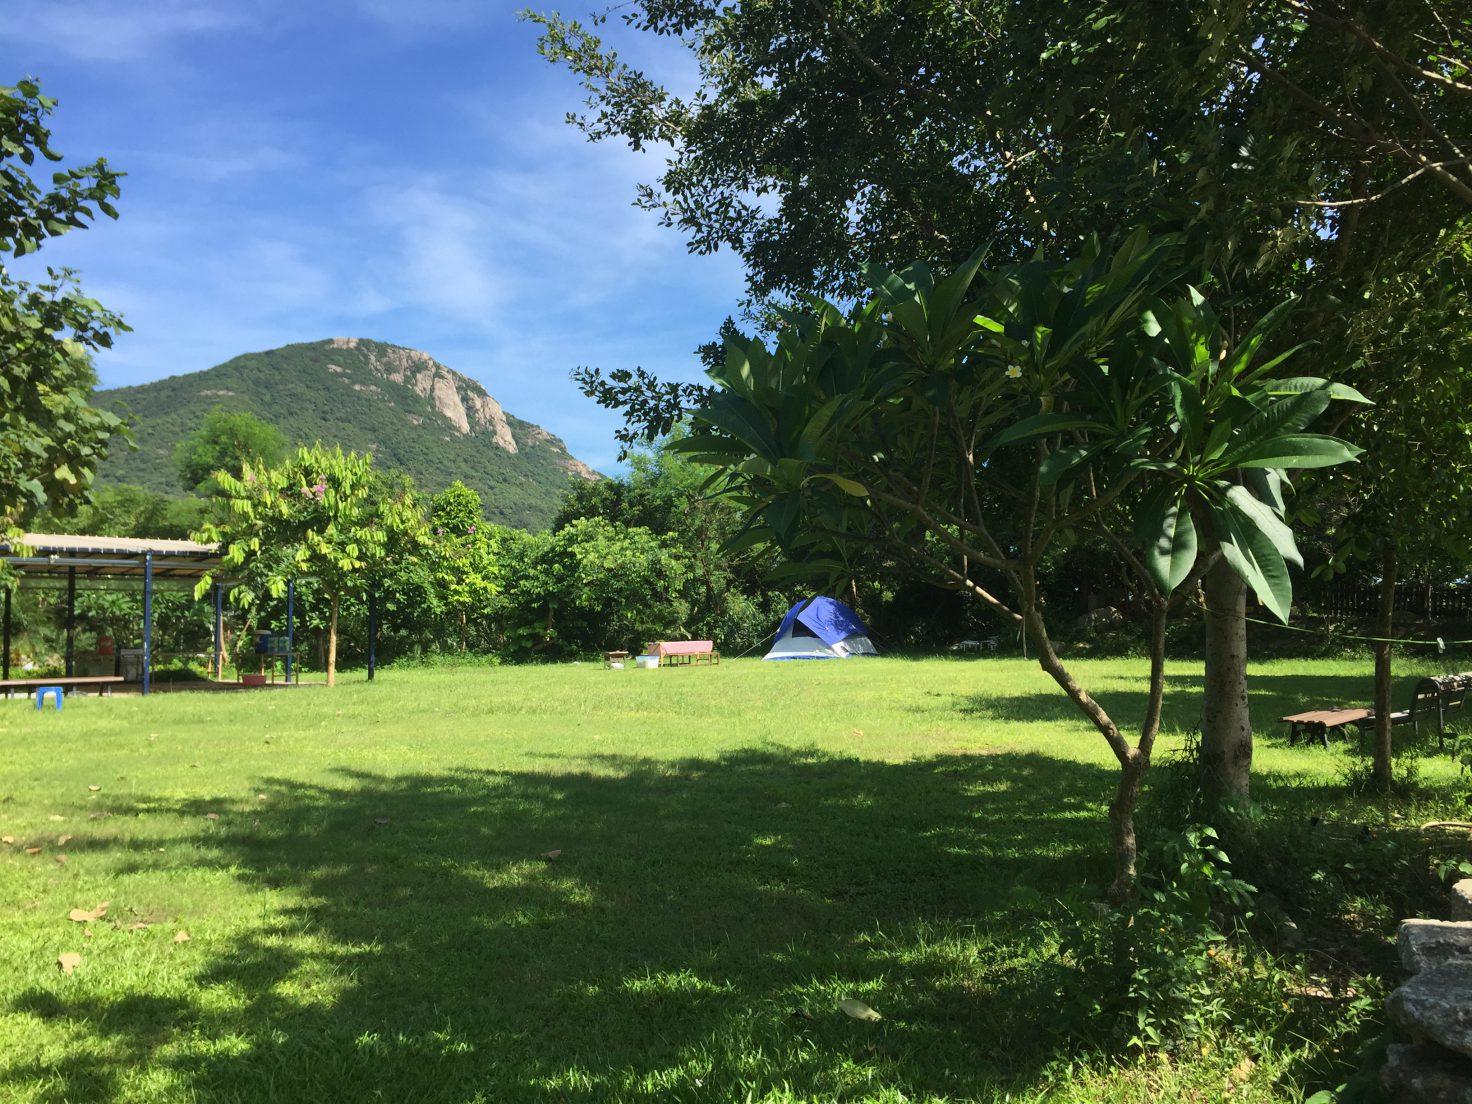 Campsite rental